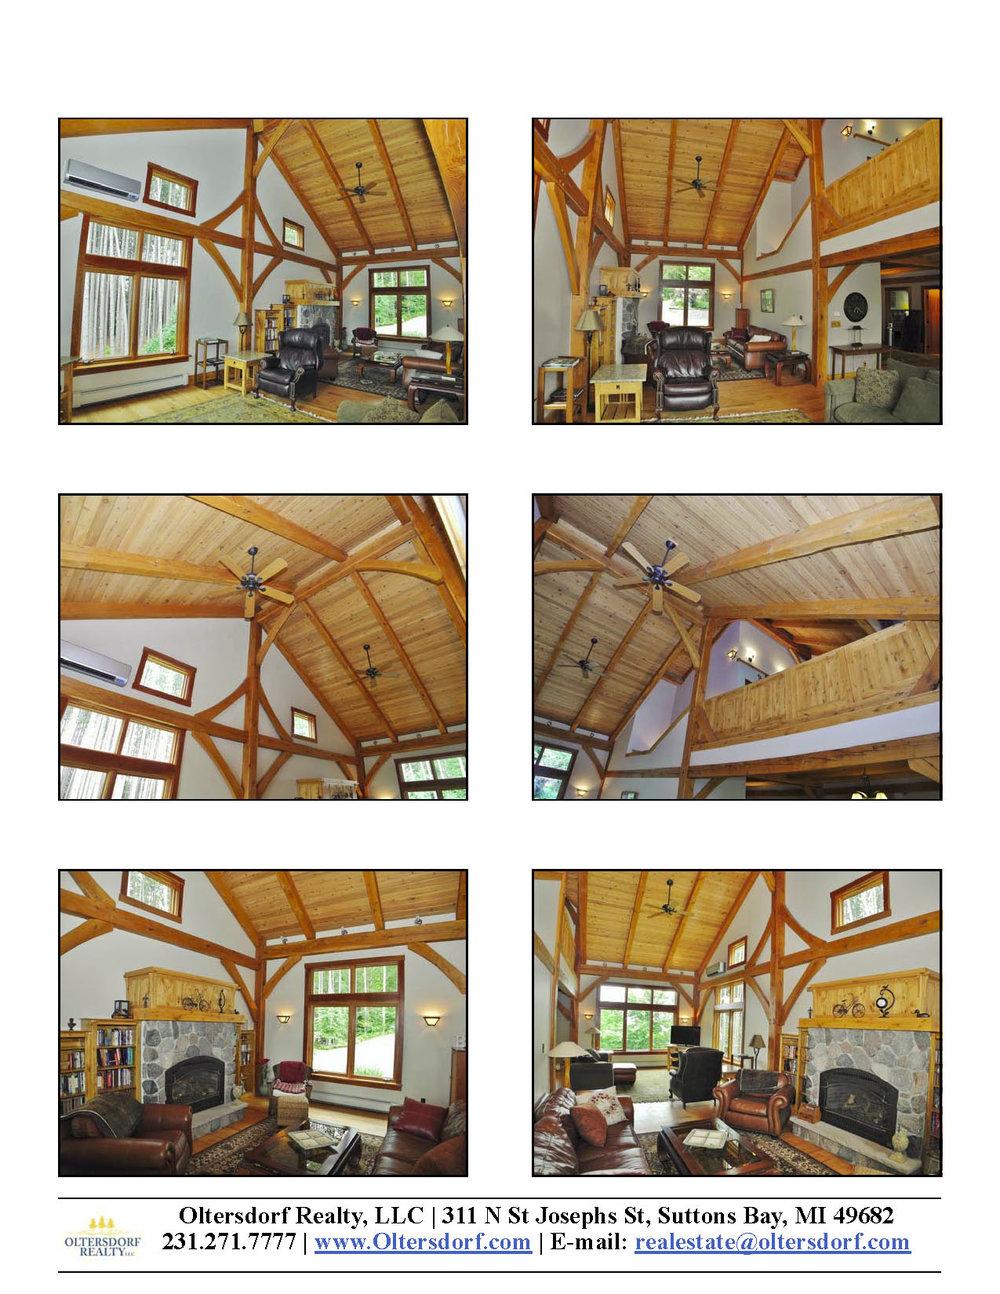 5500 E Hidden Beech, Cedar, MI - For sale by Oltersdorf Realty LLC - Marketing Packet (4).jpg